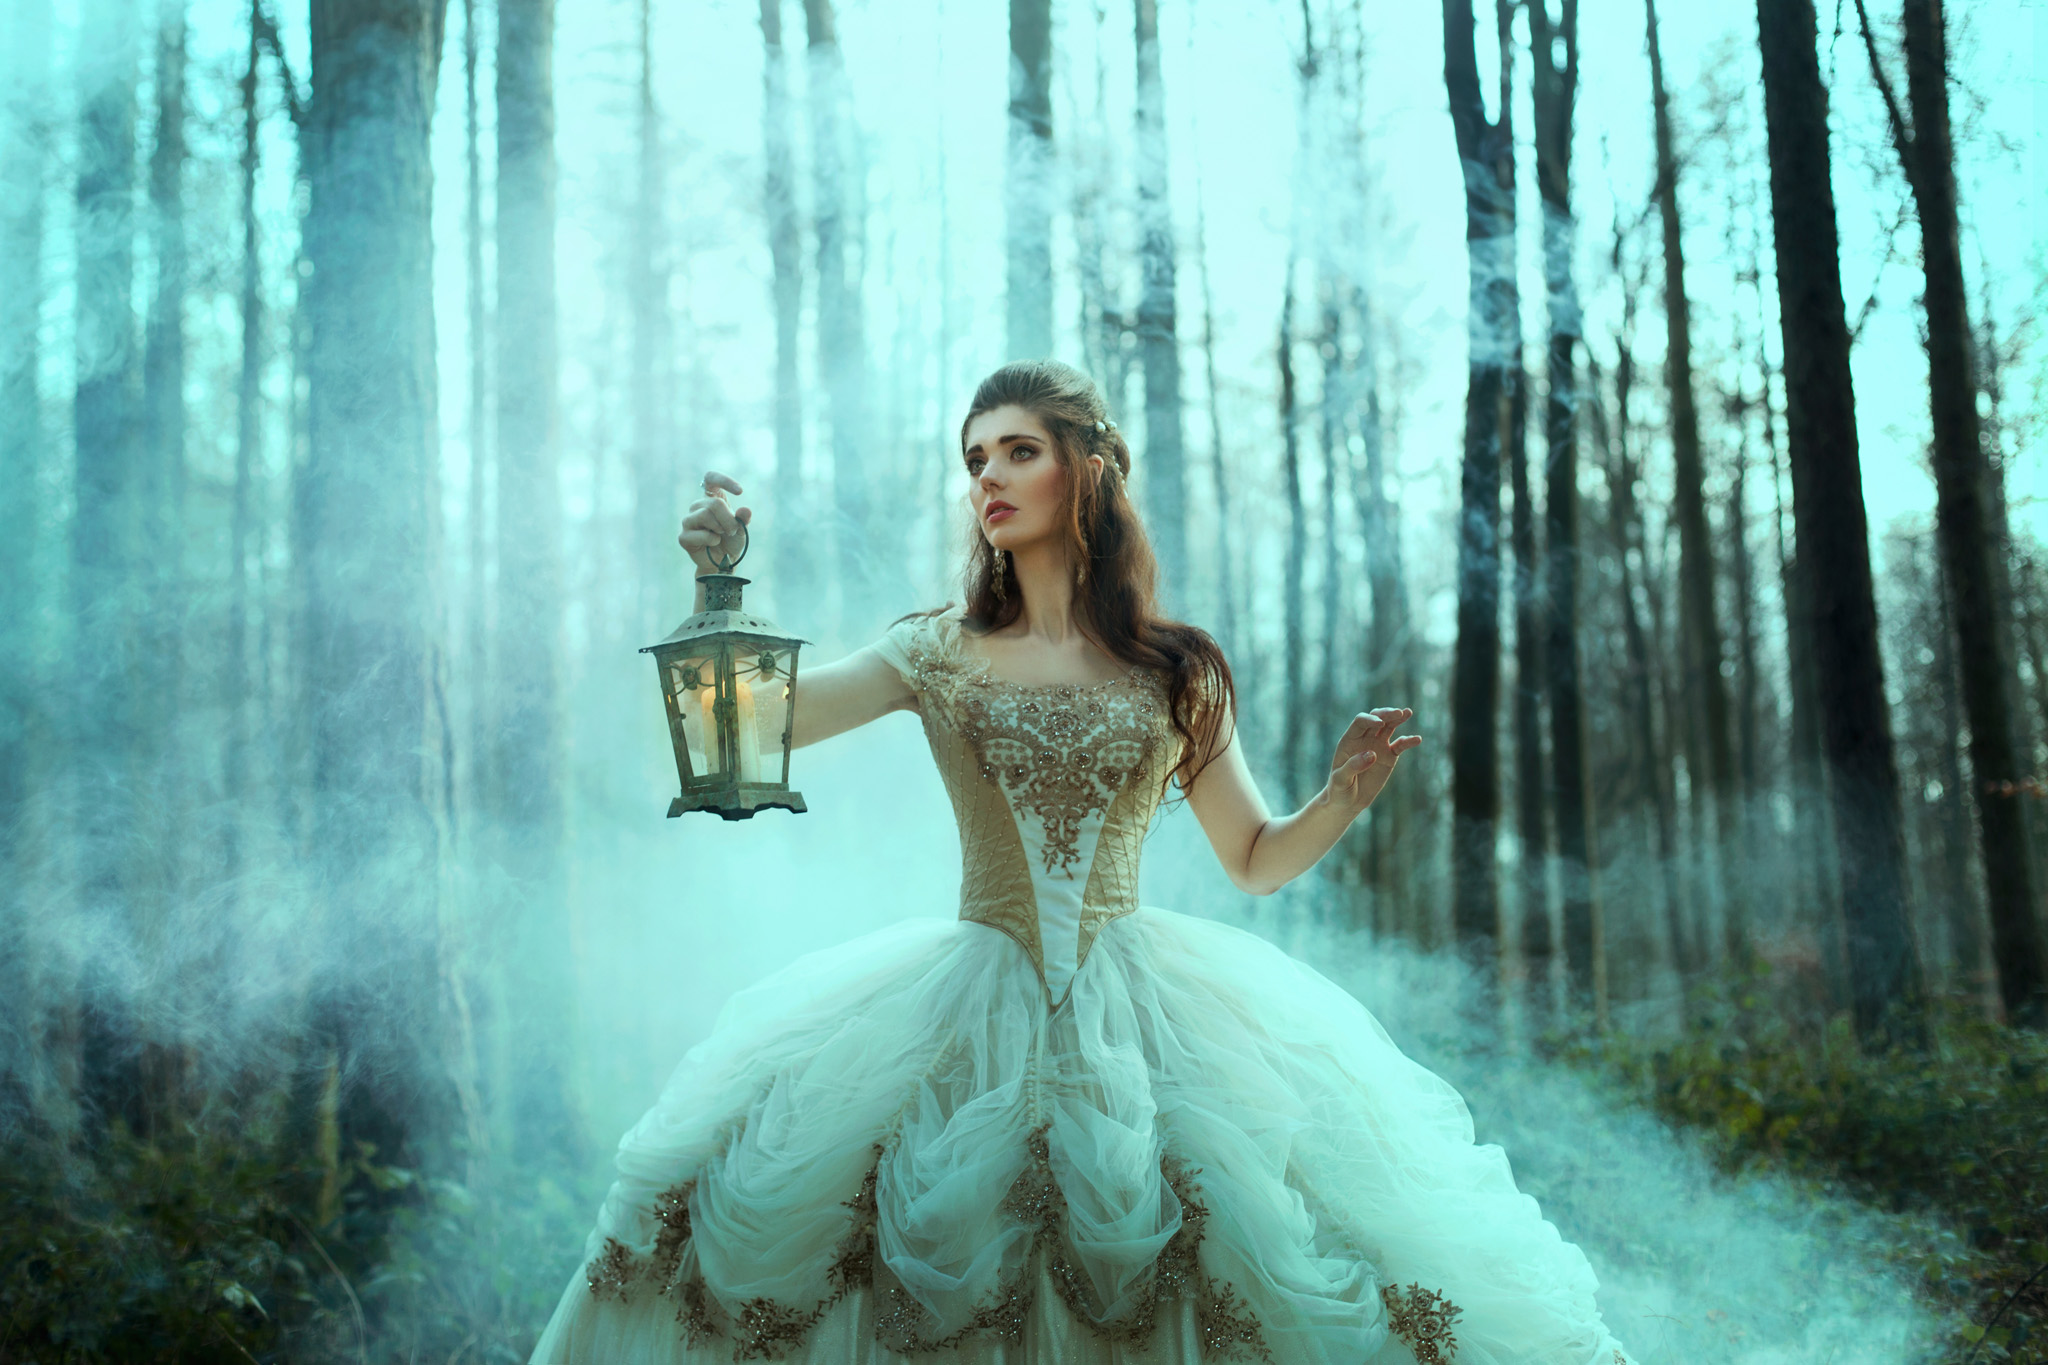 bella-kotak-fairytale-fairytales-labyrinth-david-bowie-sarah-beauty-beast-magic-magical-faerie-magazine-editorial-firefly-path-twilight-woods-lantern-ethereal-fairy-disney-ian-hencher-3s.jpg